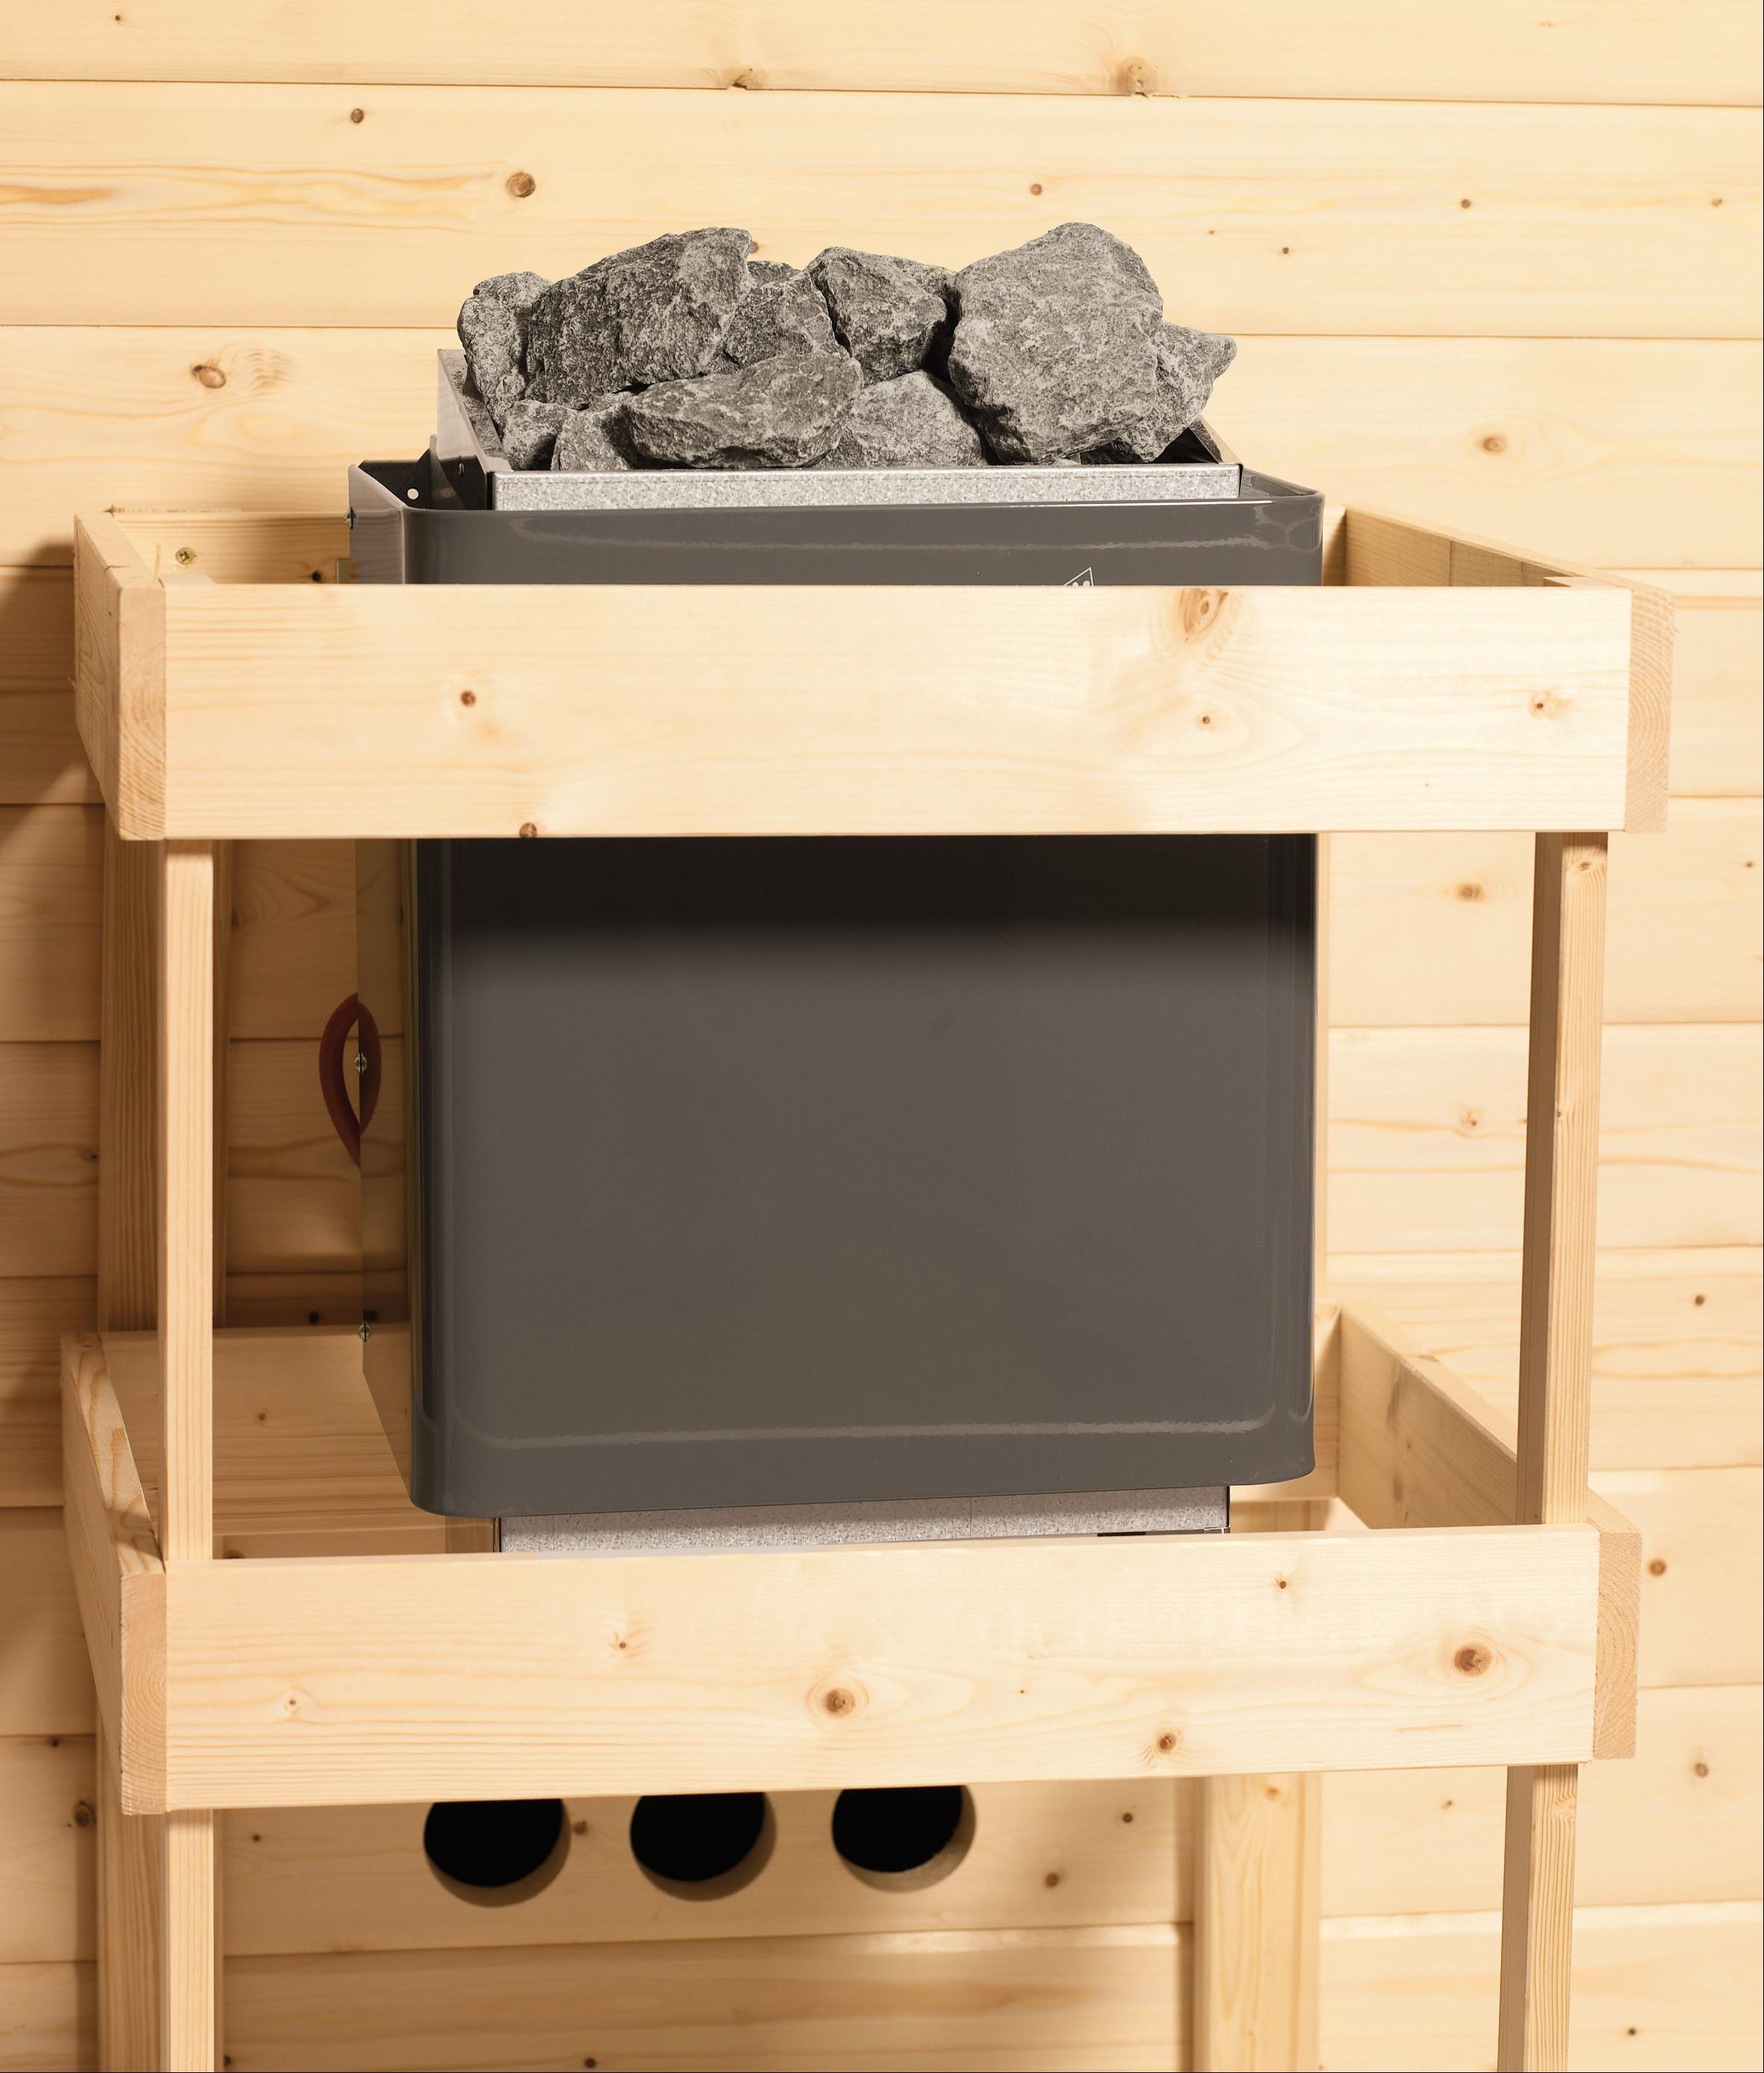 Gartensauna Karibu Saunahaus Hygge grau 38mm Saunaofen 9kW intern Bild 7